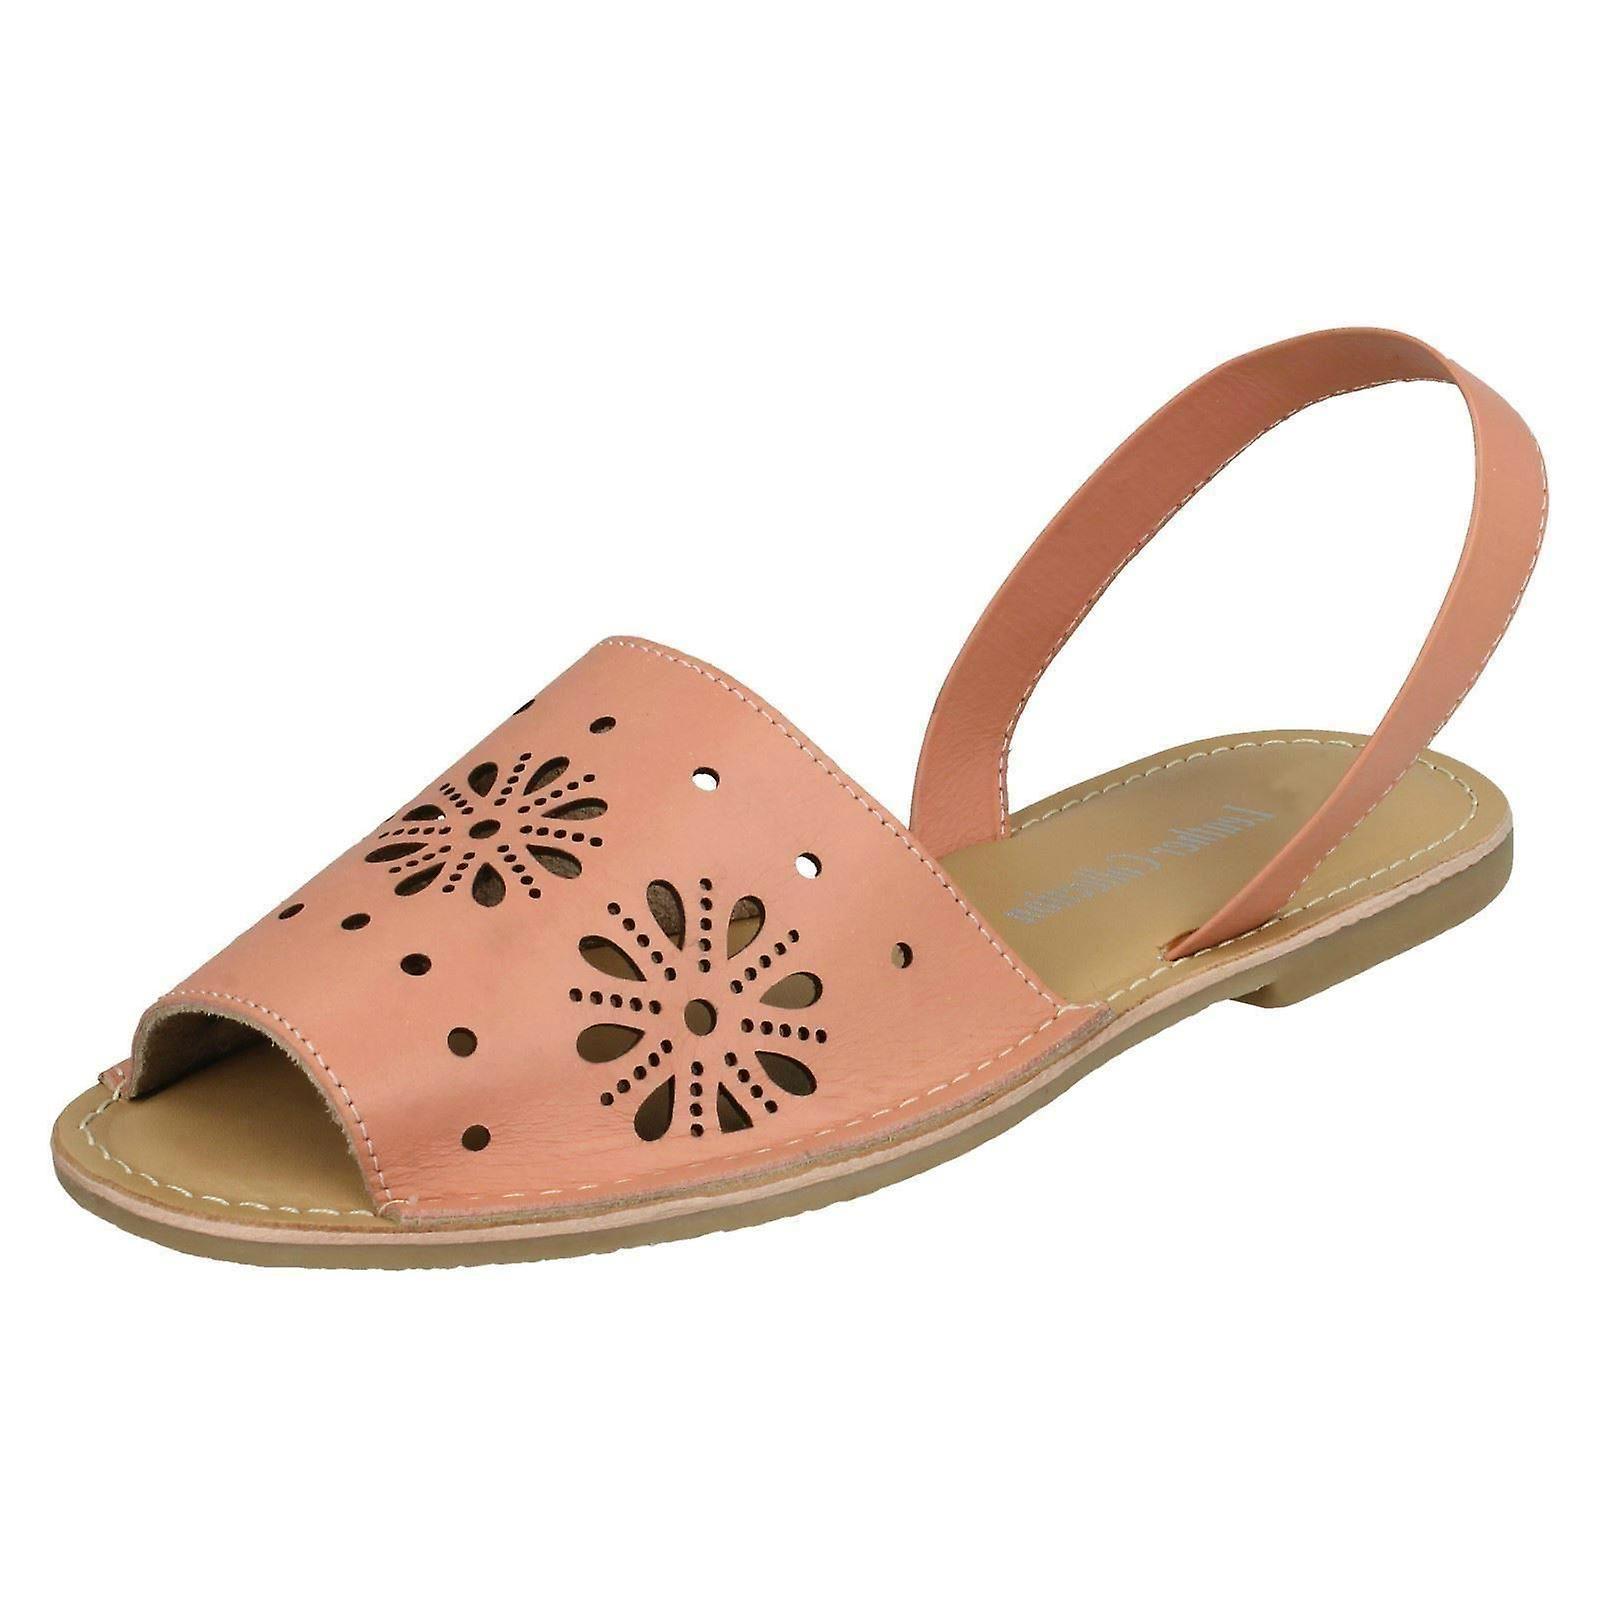 c3fbae1ddd1d https   www.fruugo.se womens-spot-pa-platta-toeloop-sandal p ...